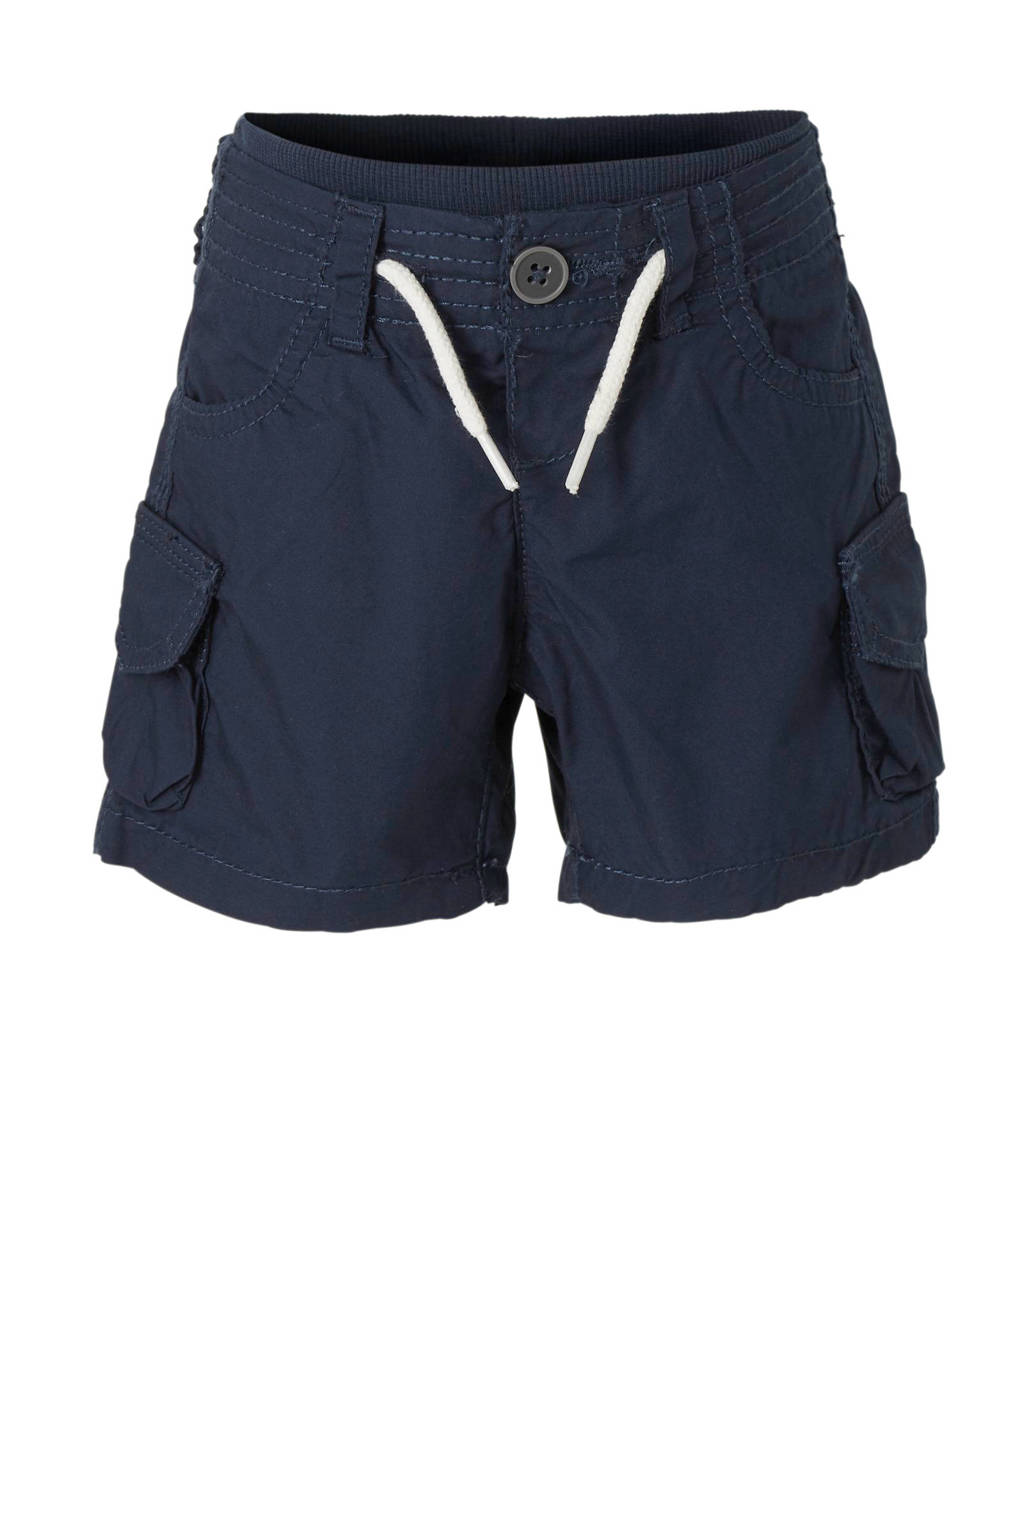 C&A Baby Club short donkerblauw, Donkerblauw